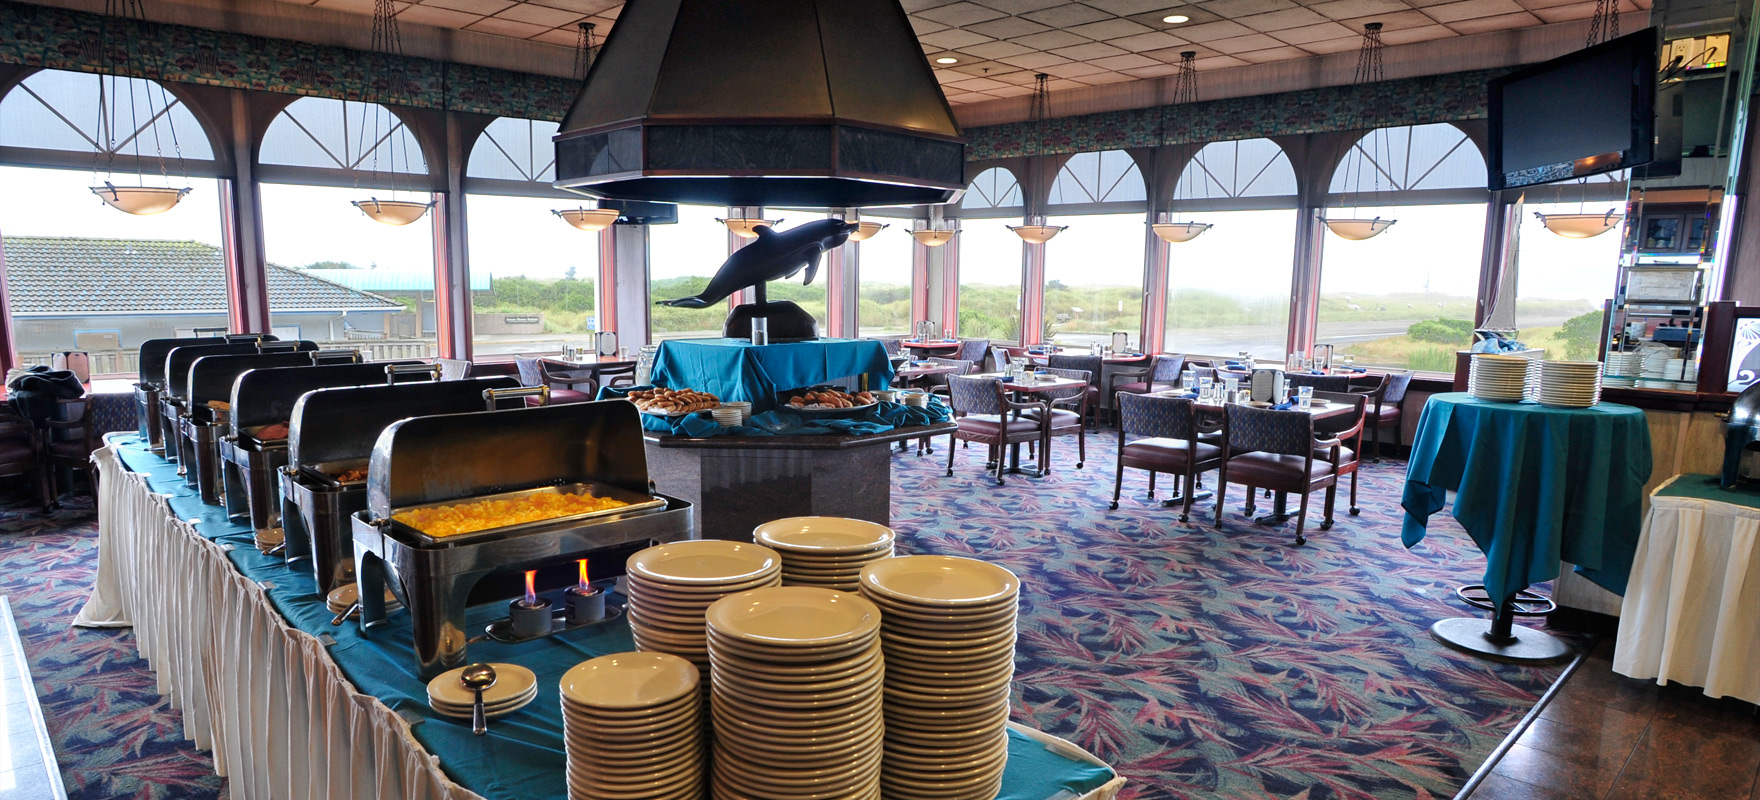 Shilo Inns Suites Hotels Ocean Shores Washington